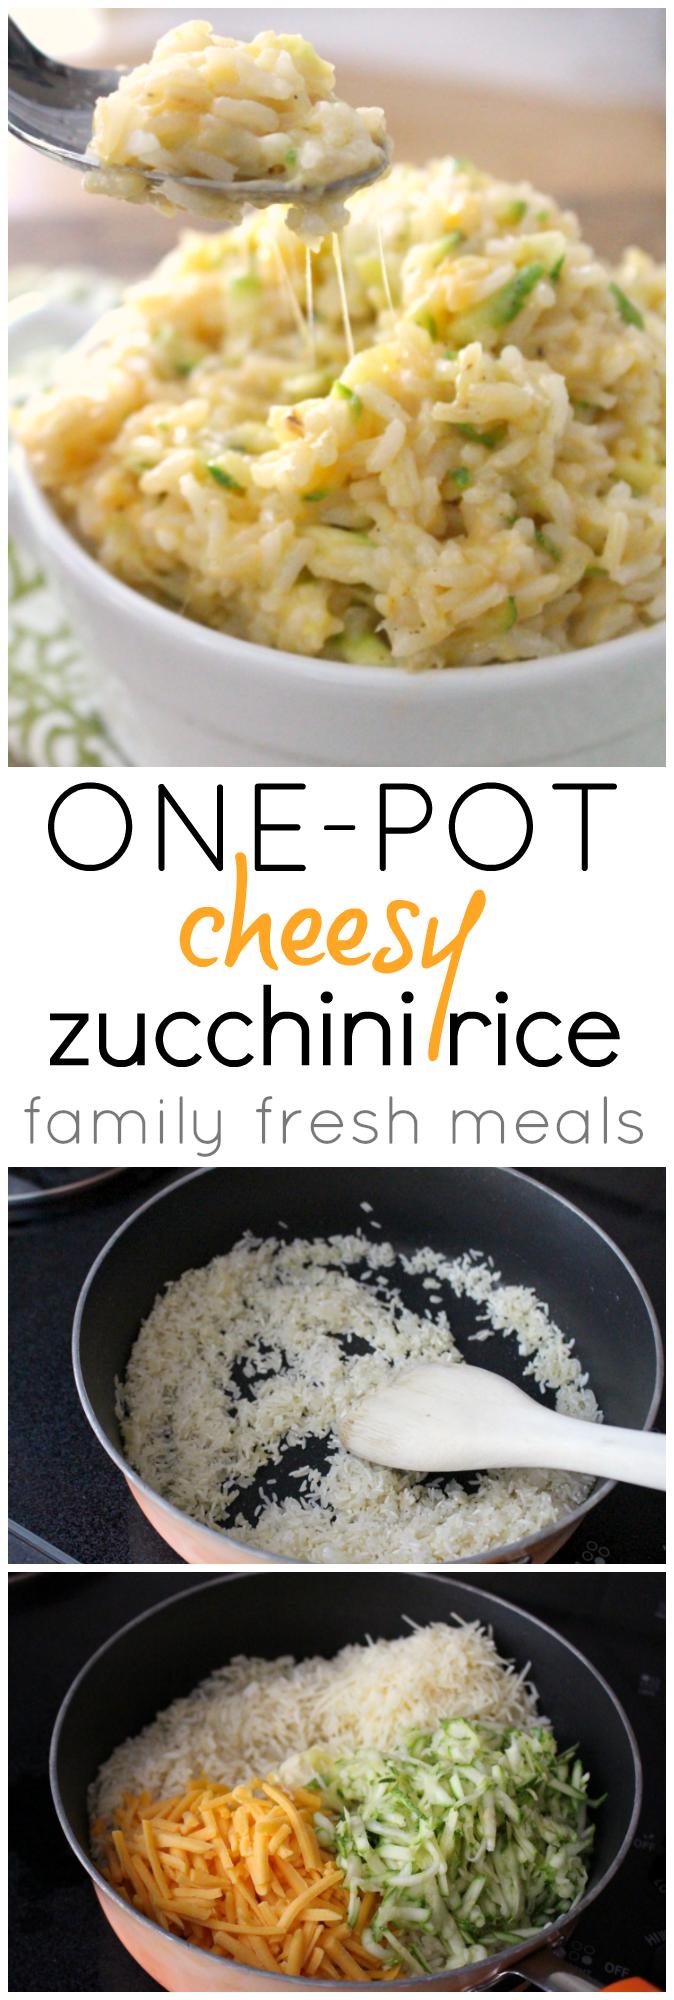 Photo of One Pot Cheesy Zucchini Rice